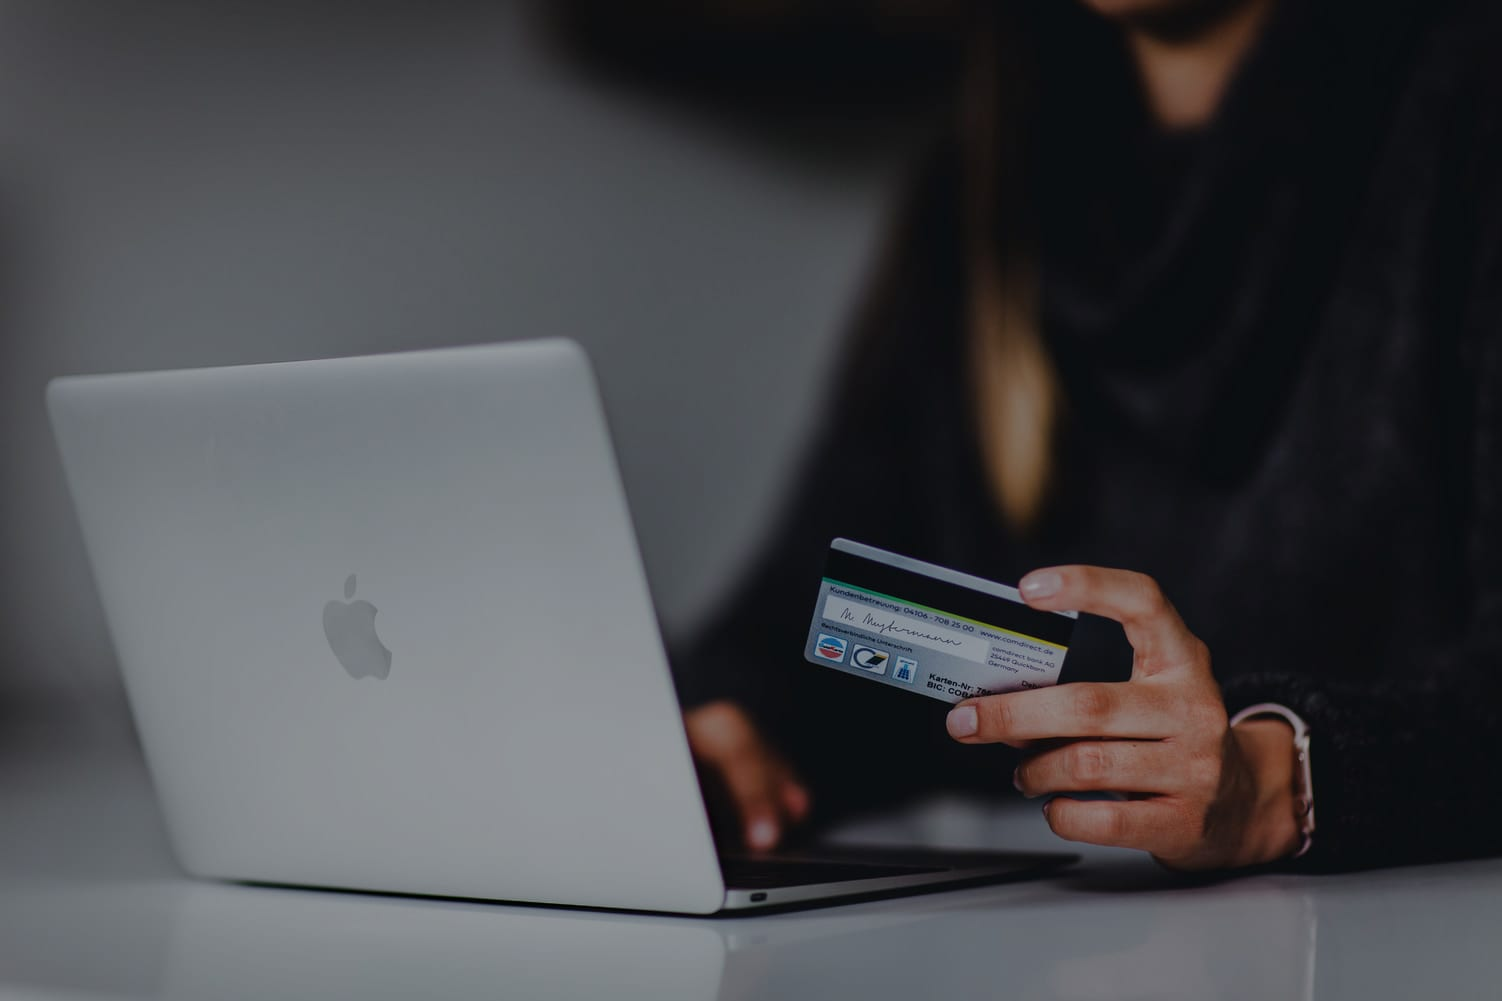 Generelt om e-commerce & webshop